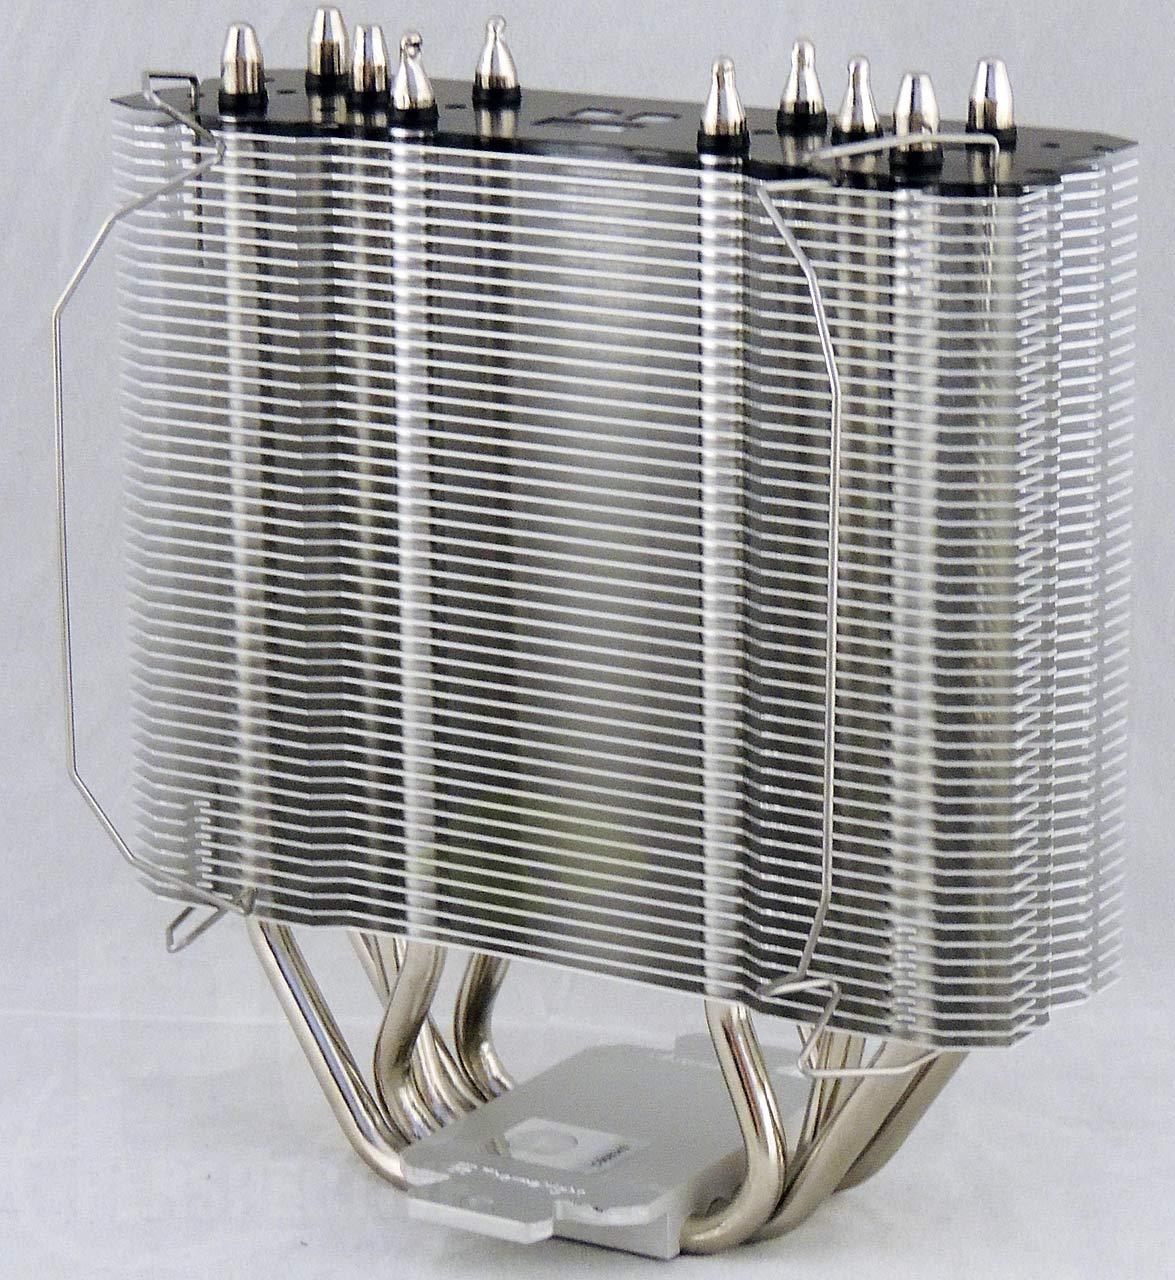 09-cooler-fanmounts-installed.jpg